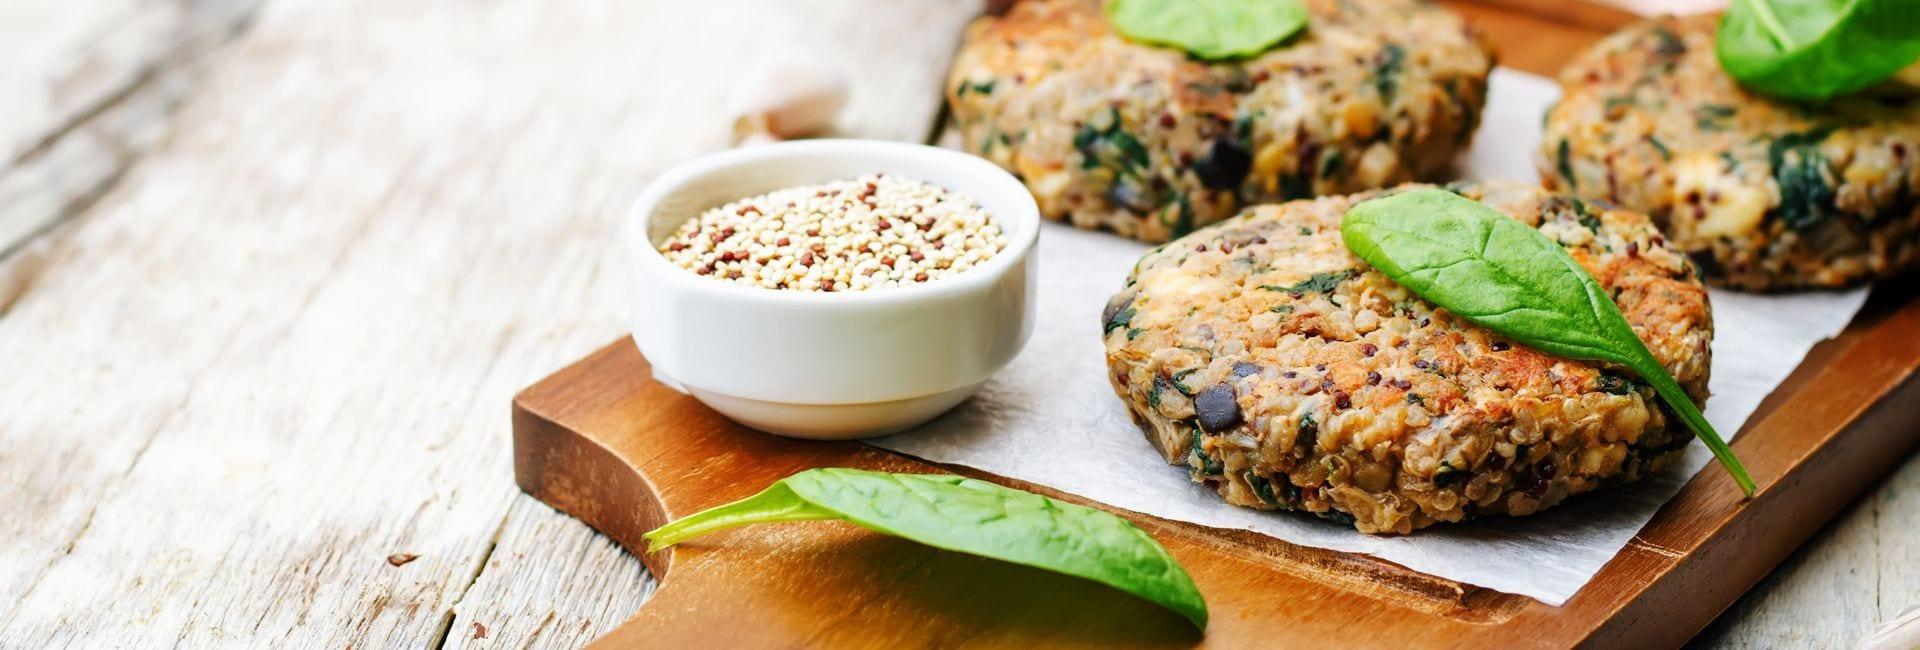 Hamburguesas de Trigo Sarraceno Bio y Verduras